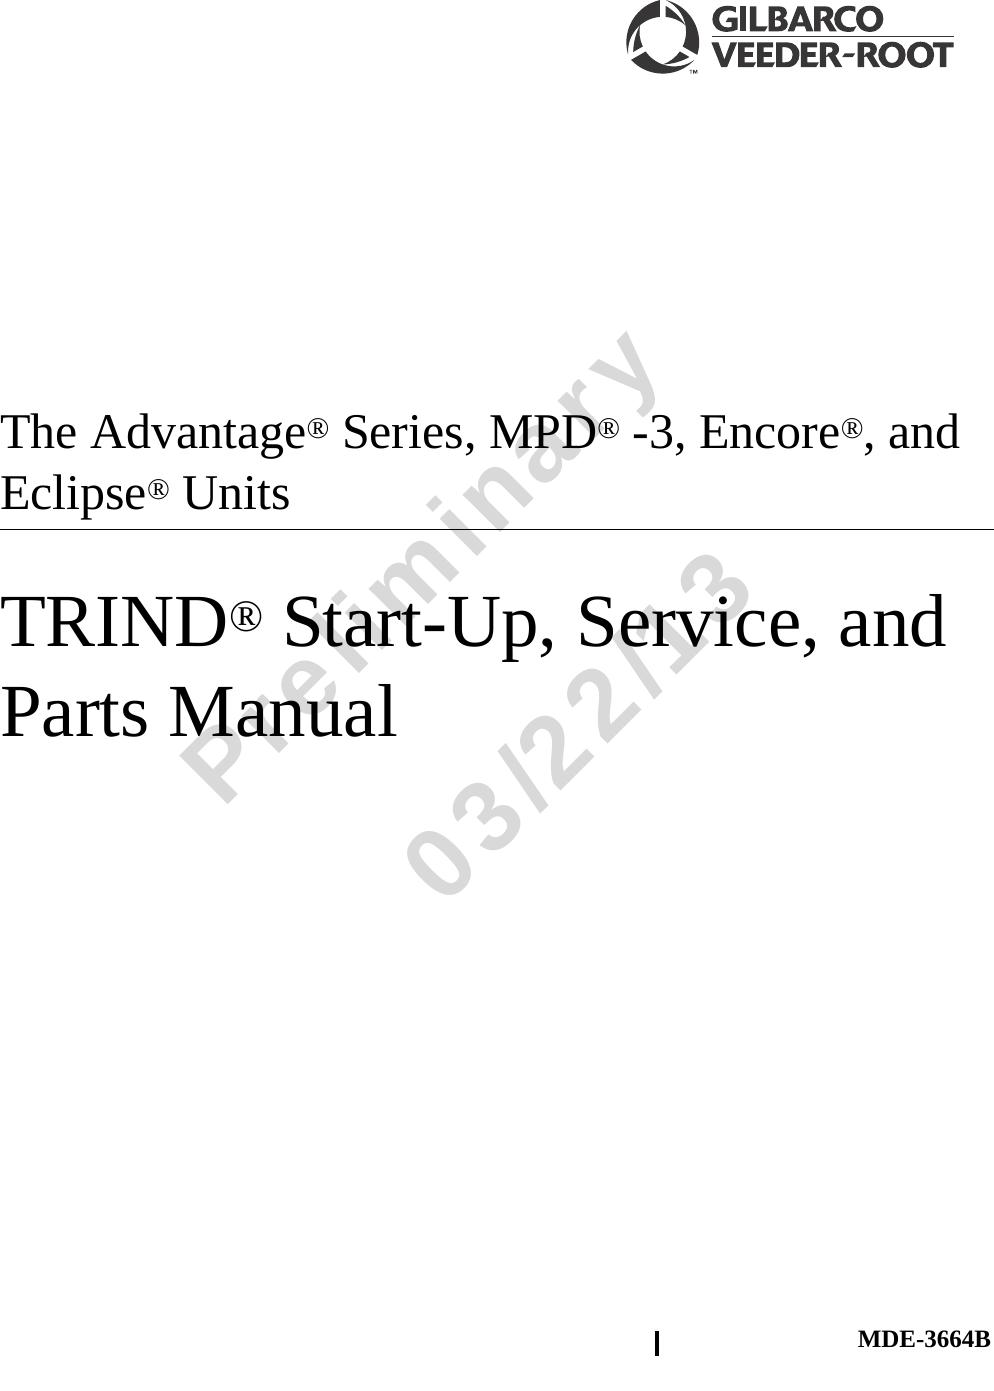 Gilbarco LFECIM RFID Module User Manual 13 0074 Exhibit Cover